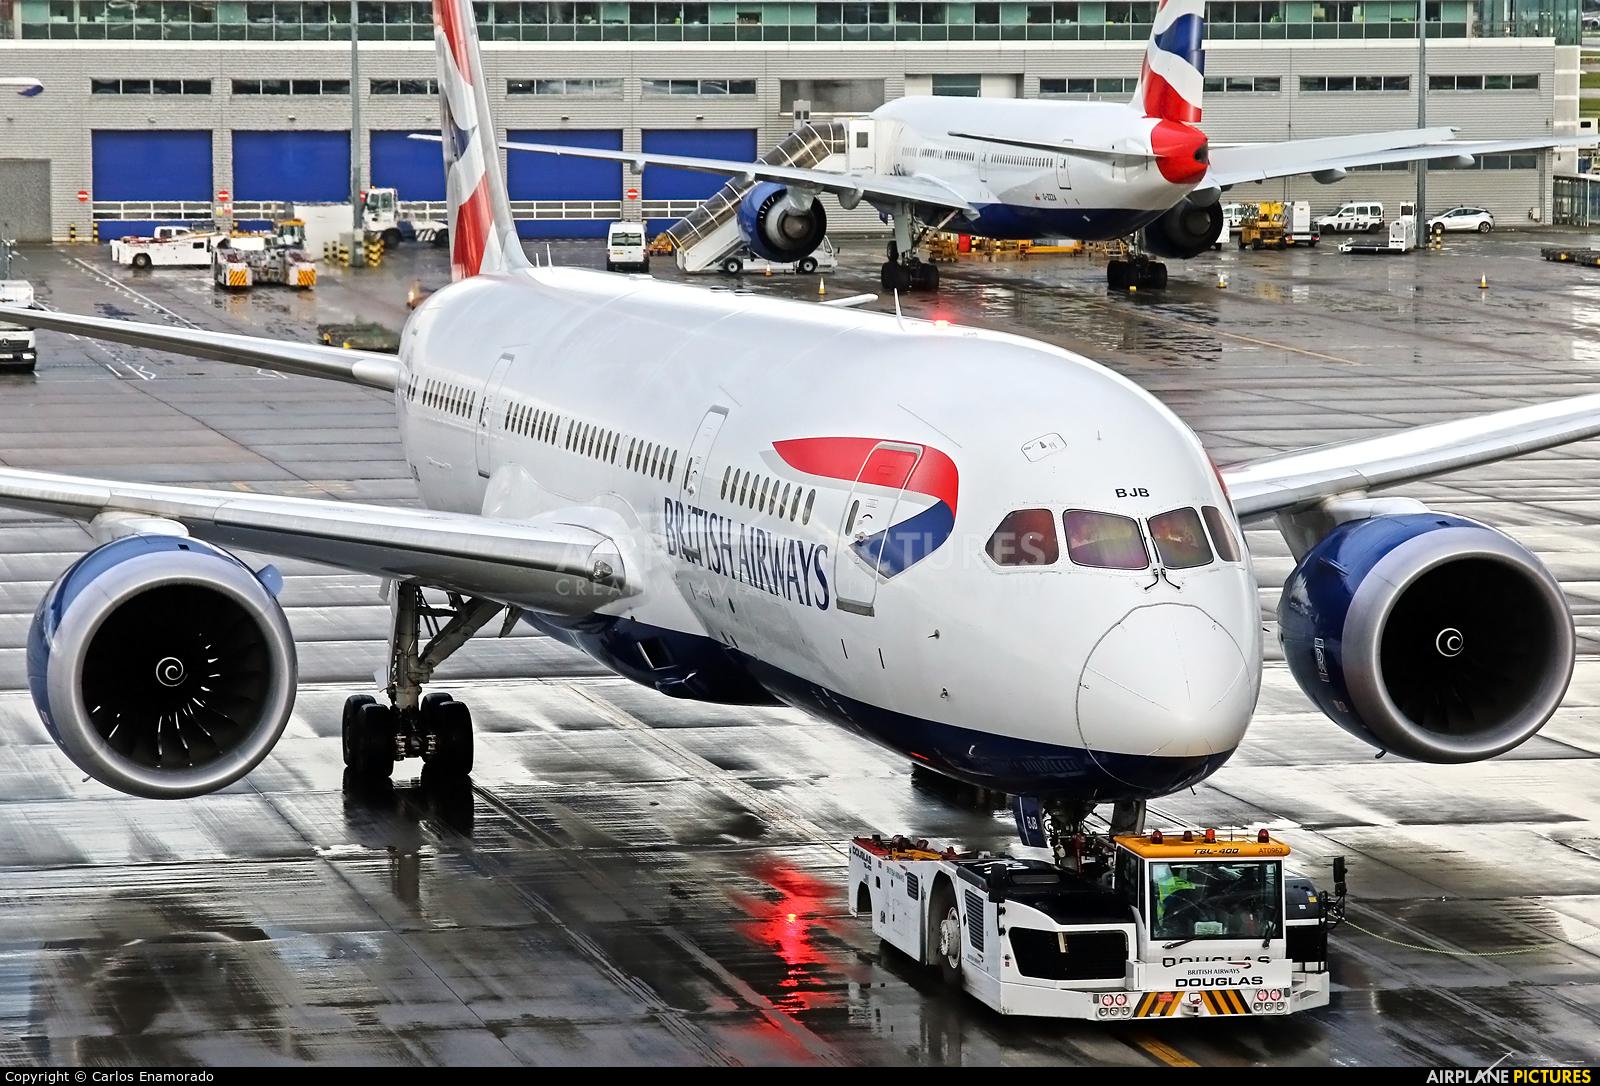 British Airways G-ZBJB aircraft at London - Heathrow